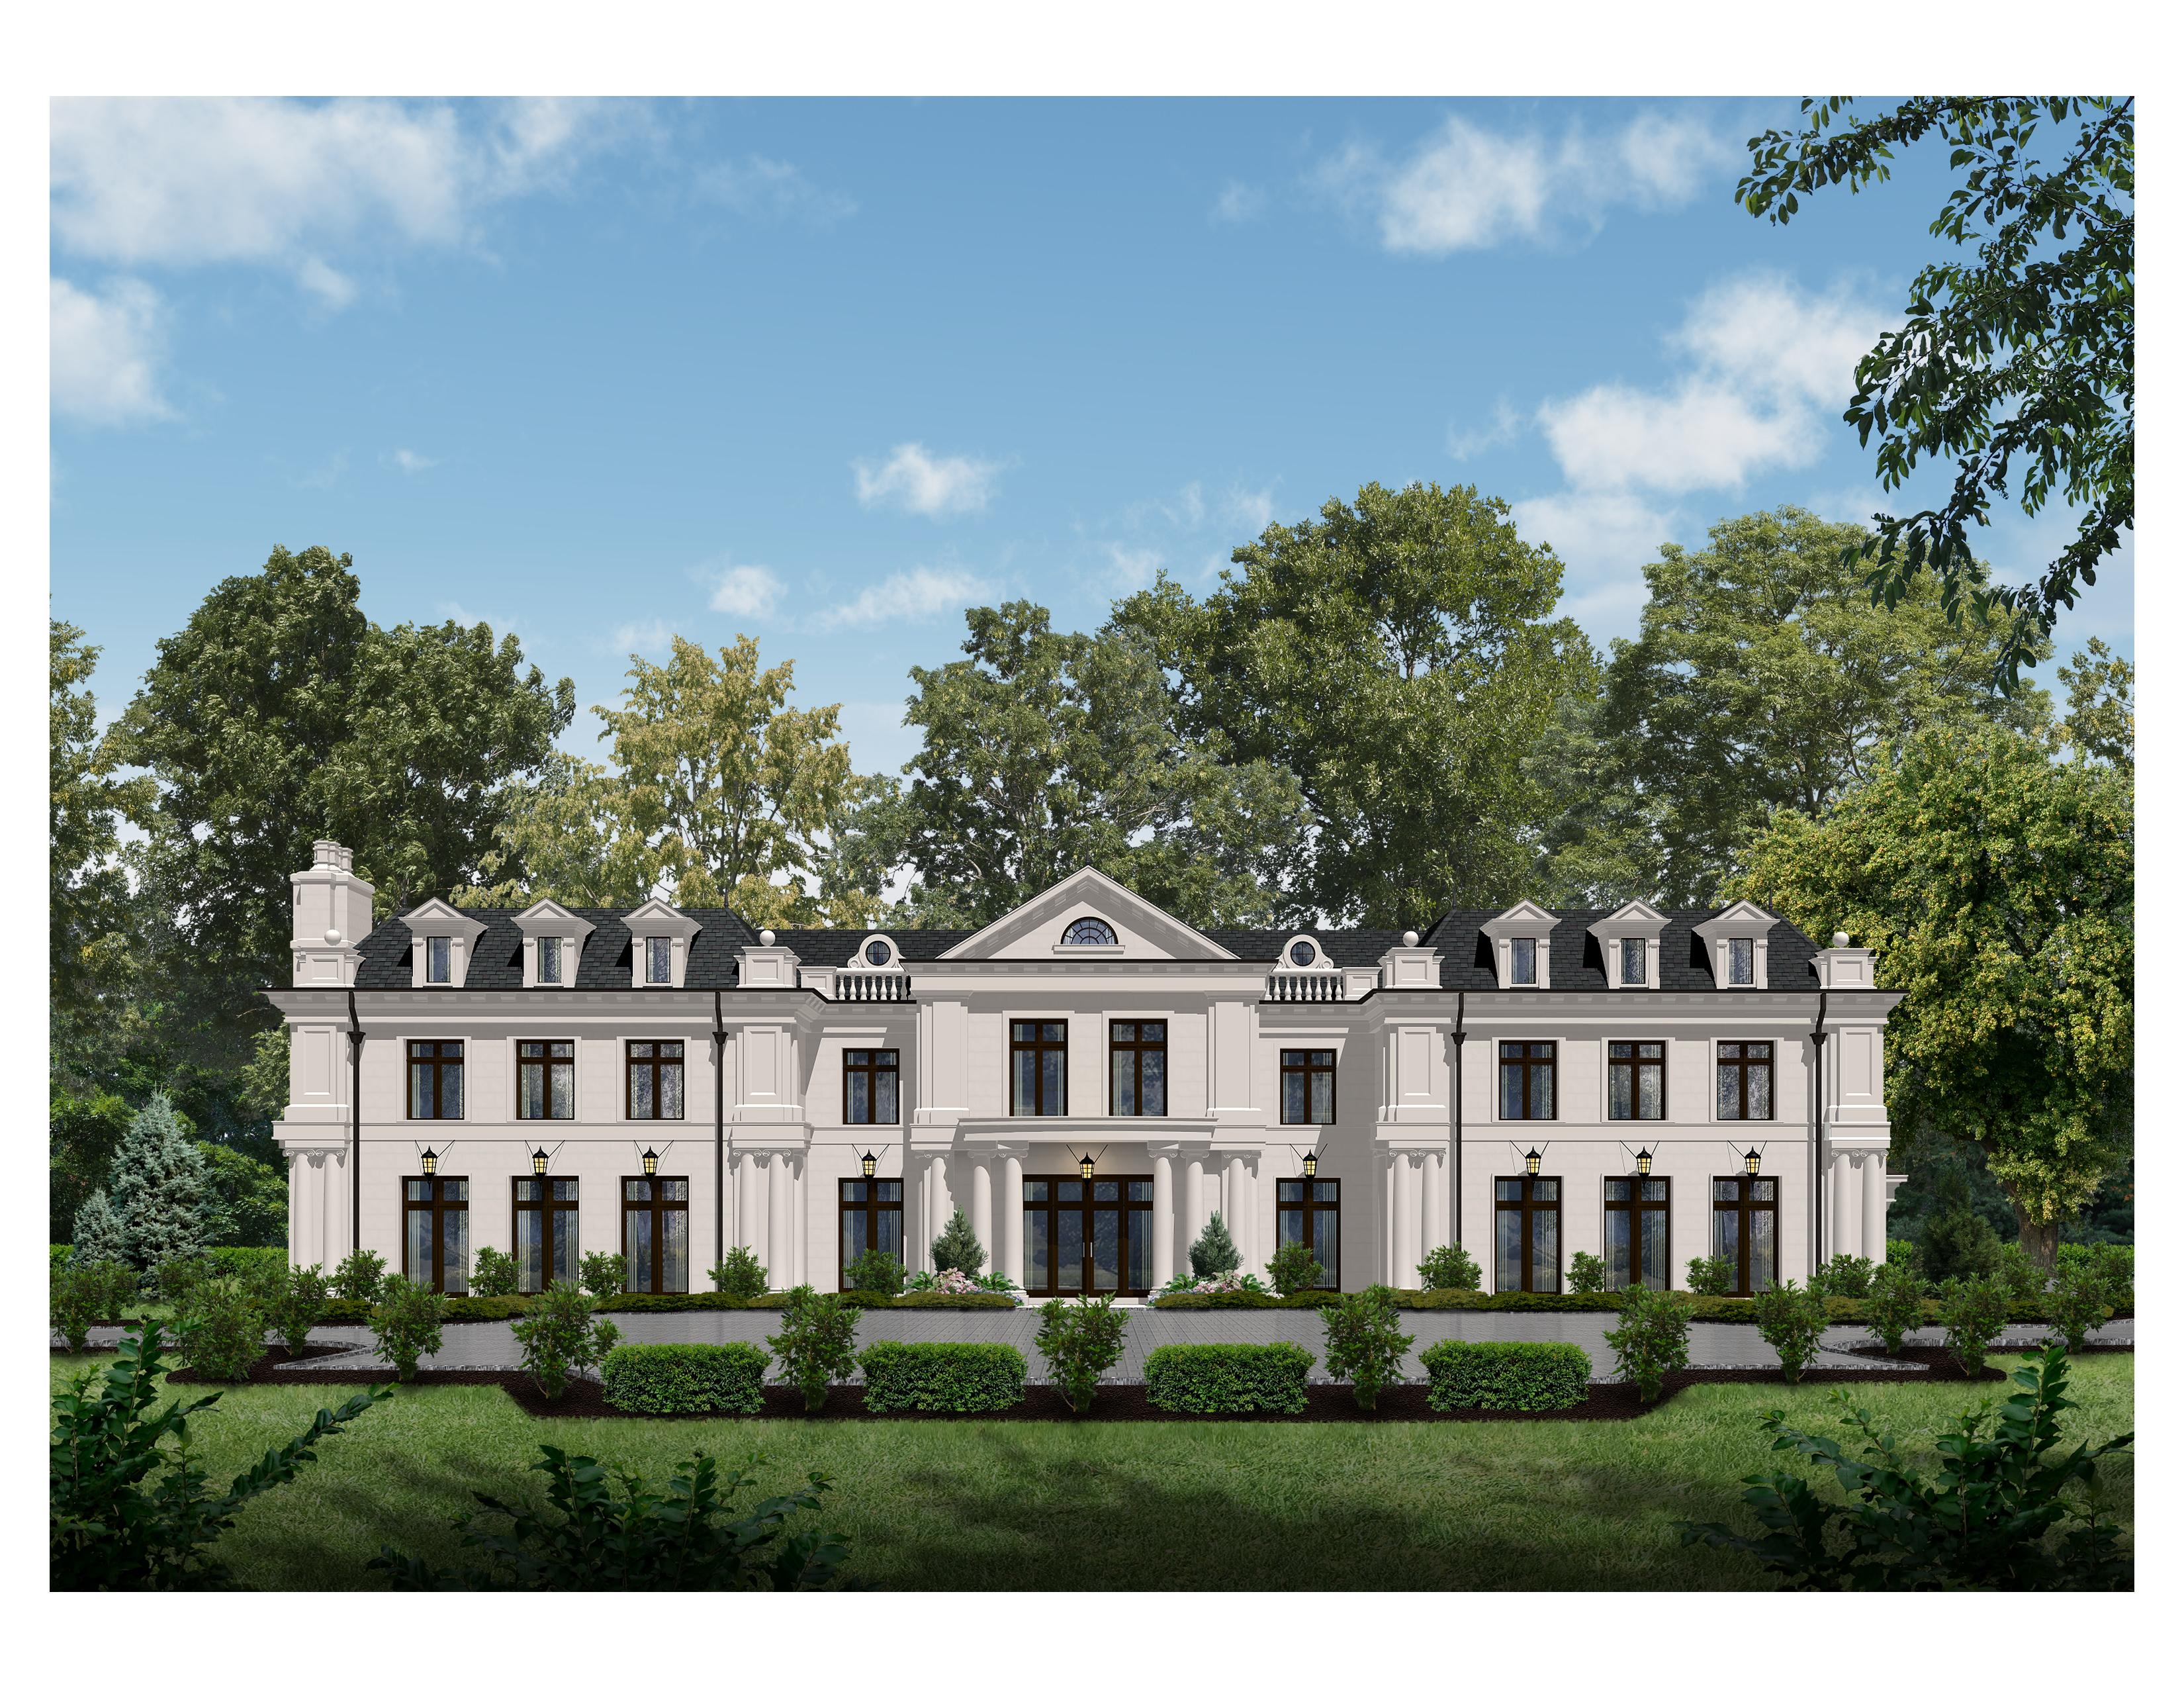 独户住宅 为 销售 在 Opulent Beverly Hills Inspired Estate 23 Stone Tower Dr. 阿尔派恩, 新泽西州 07620 美国